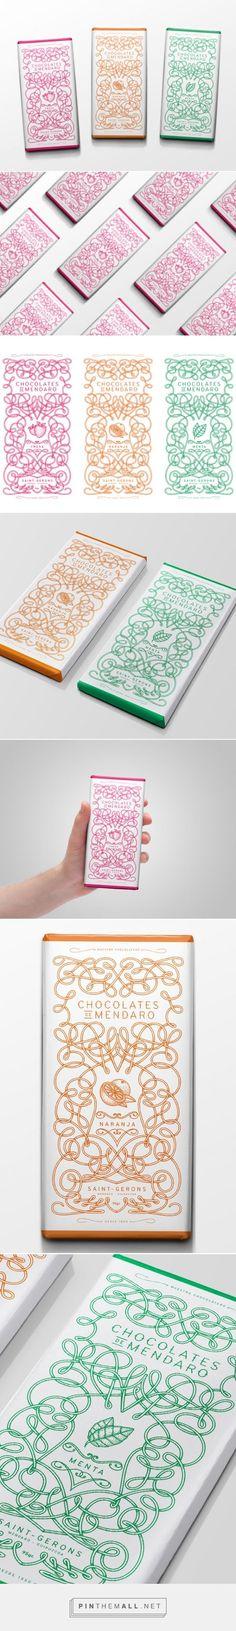 Chocolates De Mendaro #packaging #chocolate